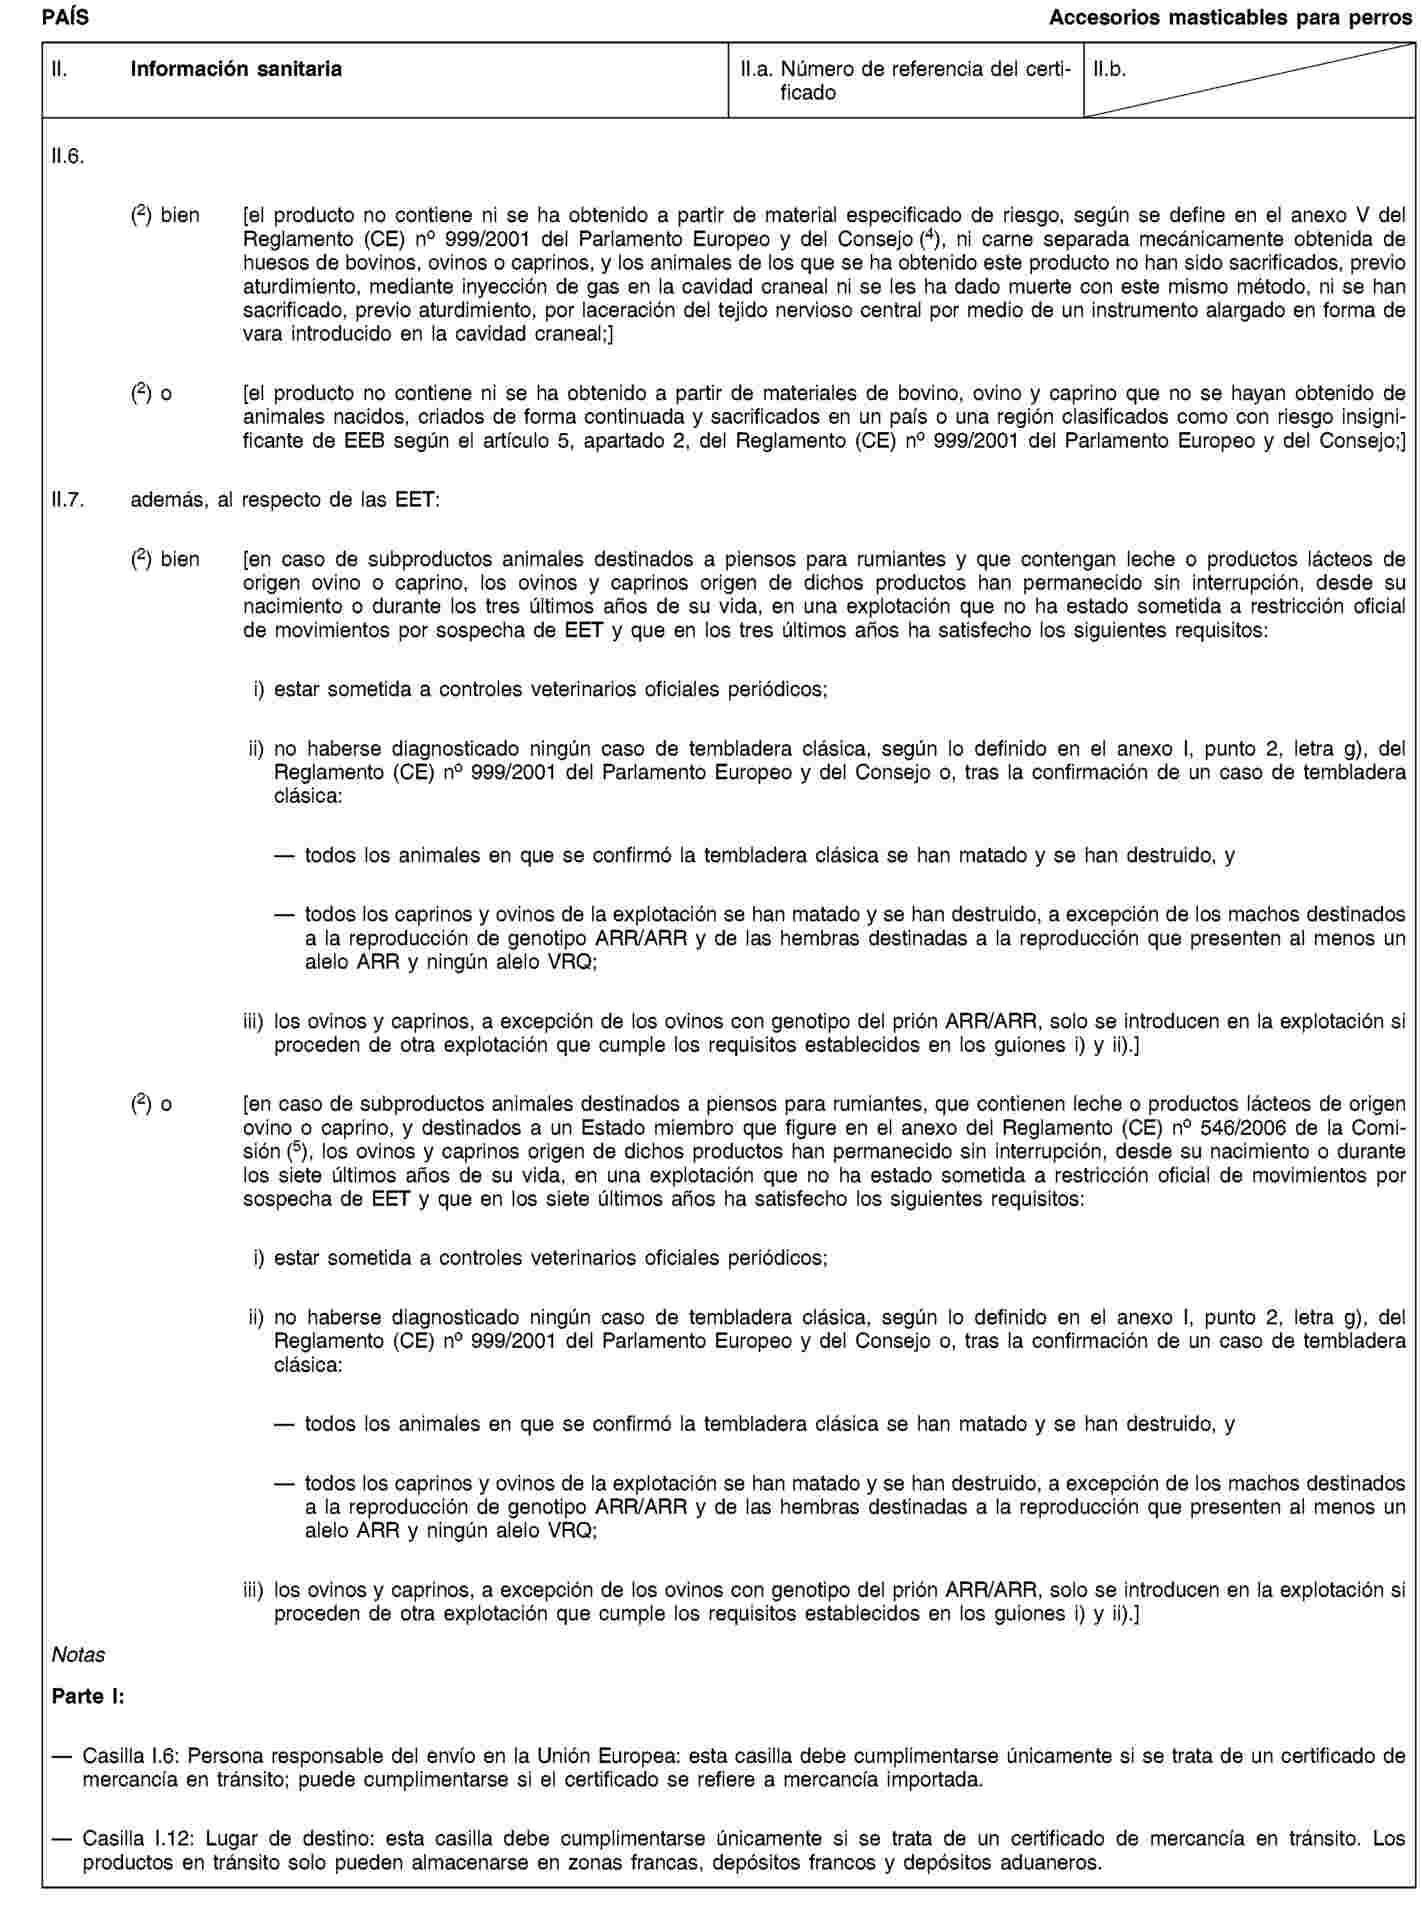 Imagen: https://eur-lex.europa.eu/resource.html?uri=uriserv:OJ.L_.2011.054.01.0001.01.SPA.xhtml.L_2011054ES.01014401.tif.jpg